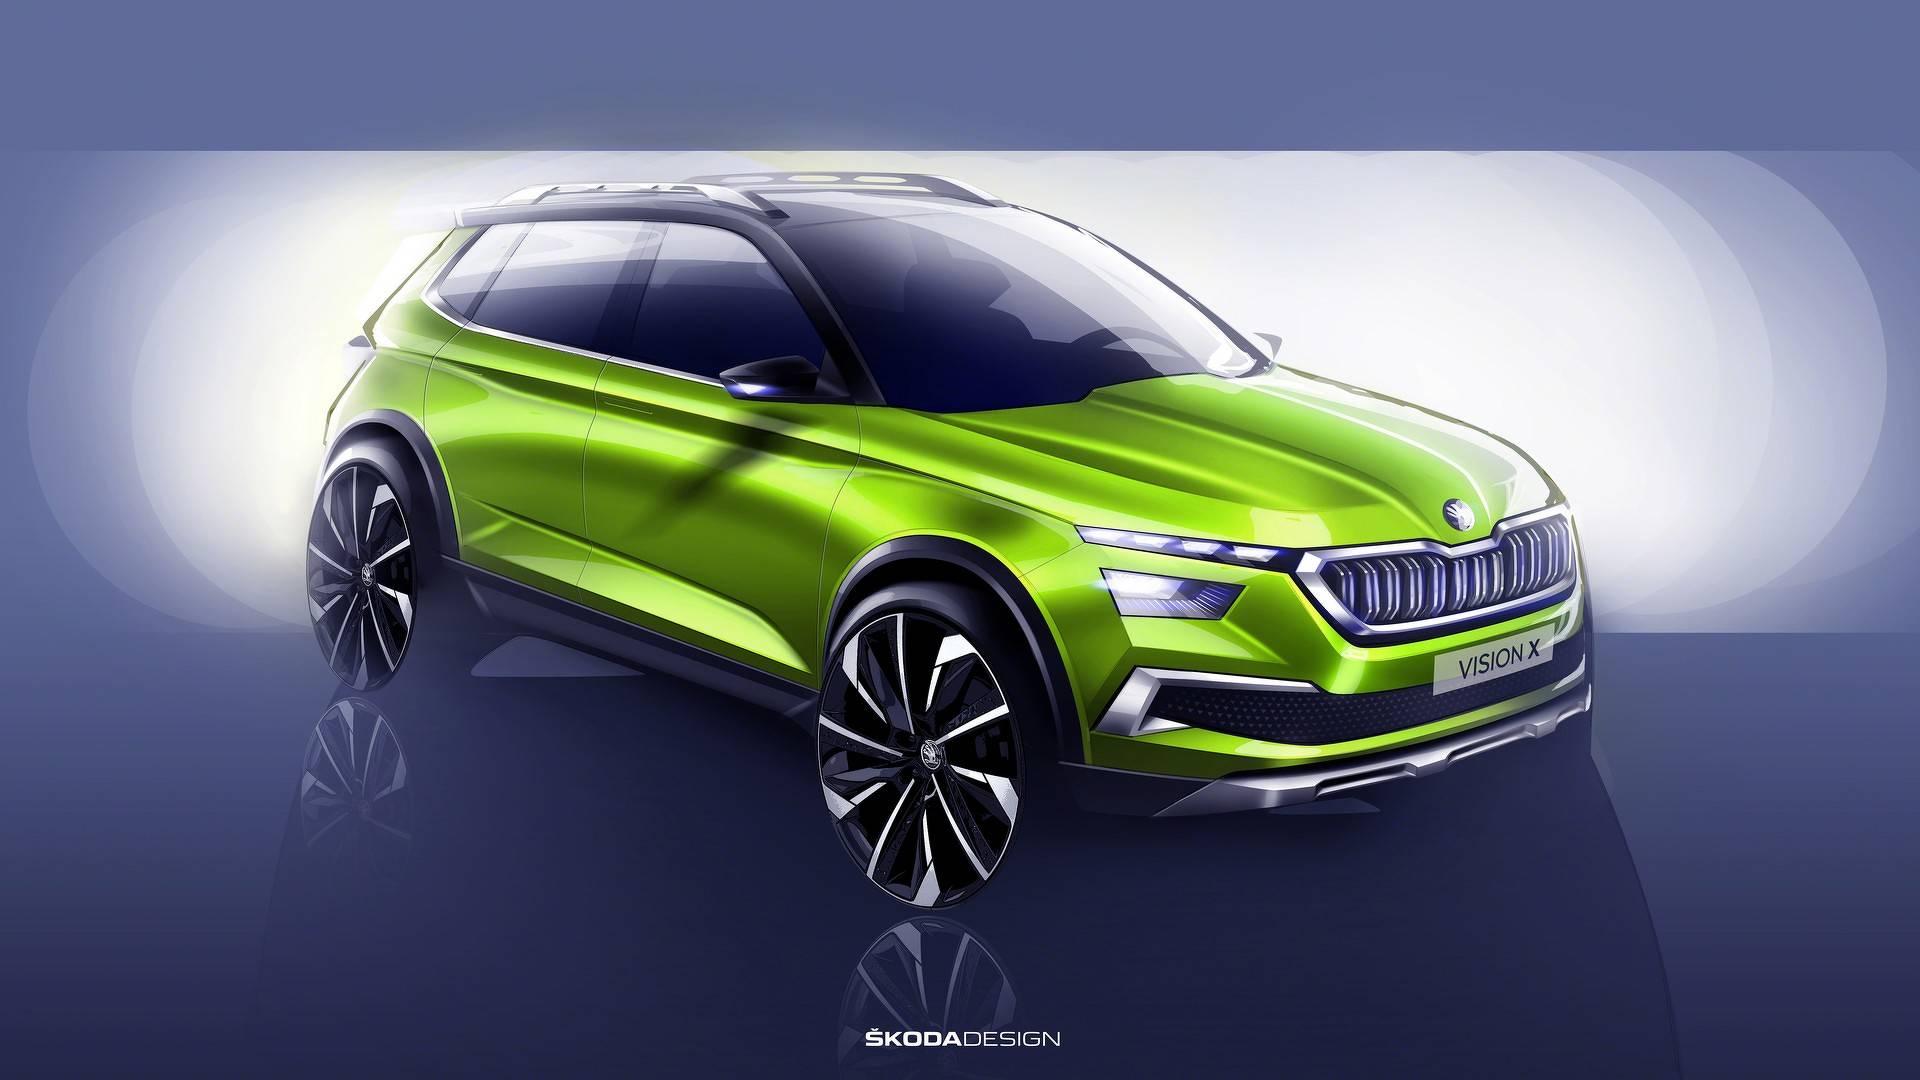 skoda vision x concept اسکودا ایکس یک خودرو کاملا منحصر و زیبا   اجاره ماشین